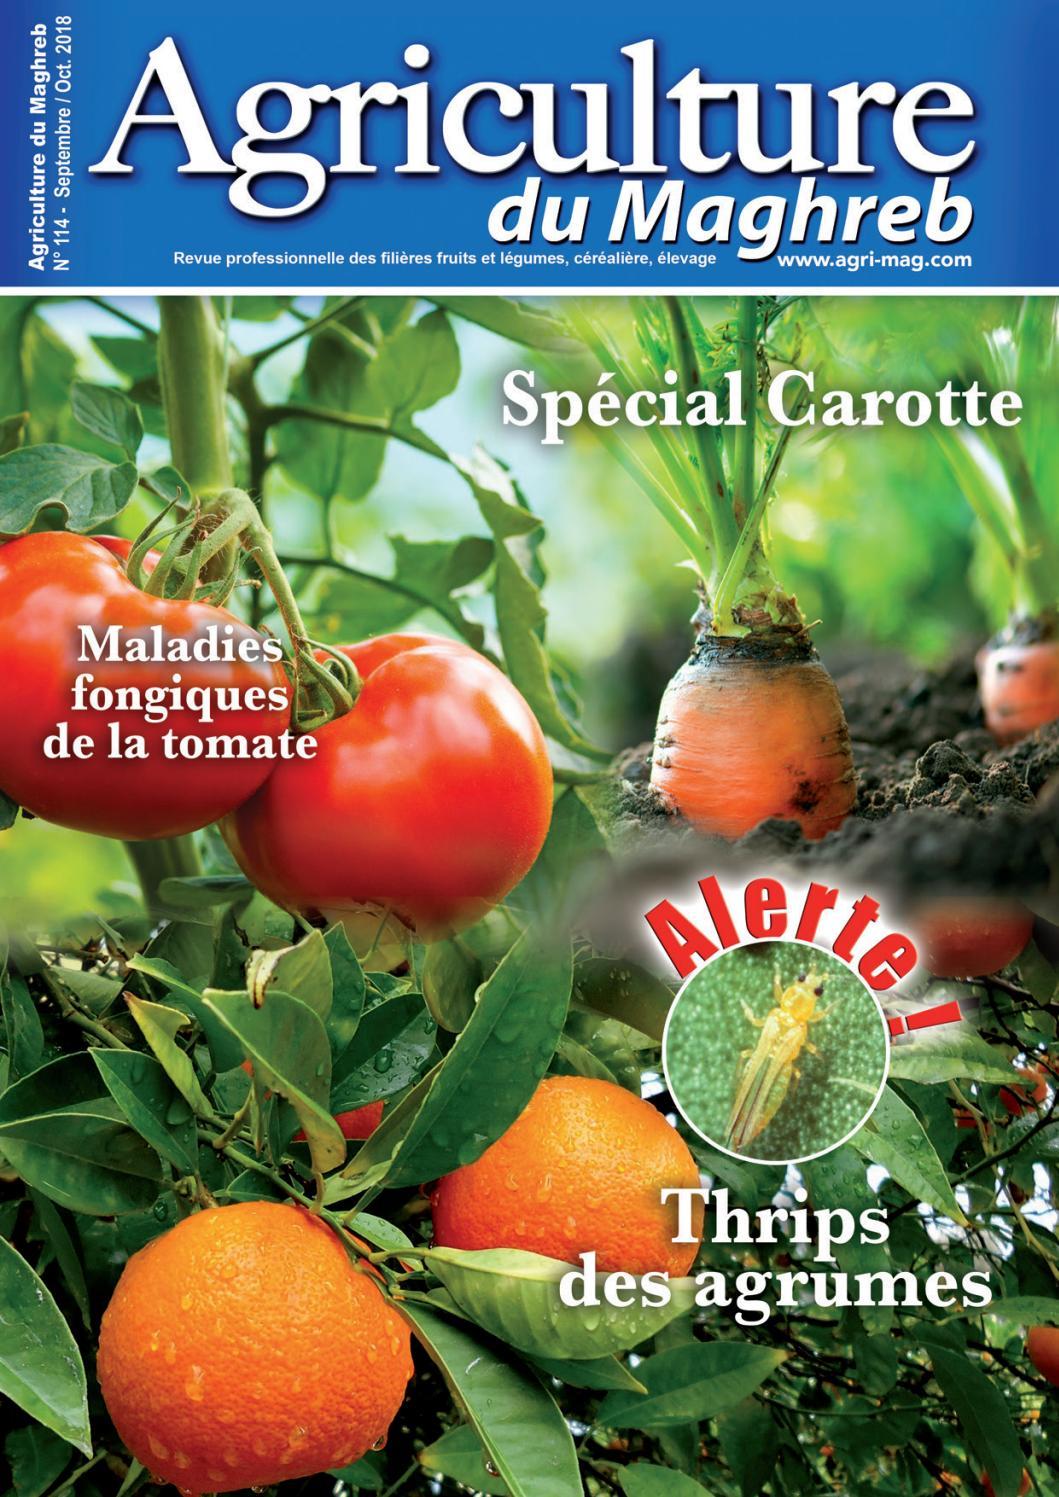 Comment Sauver Un Oranger Du Mexique agriculture du maghreb n° 114agriculture maghreb - issuu